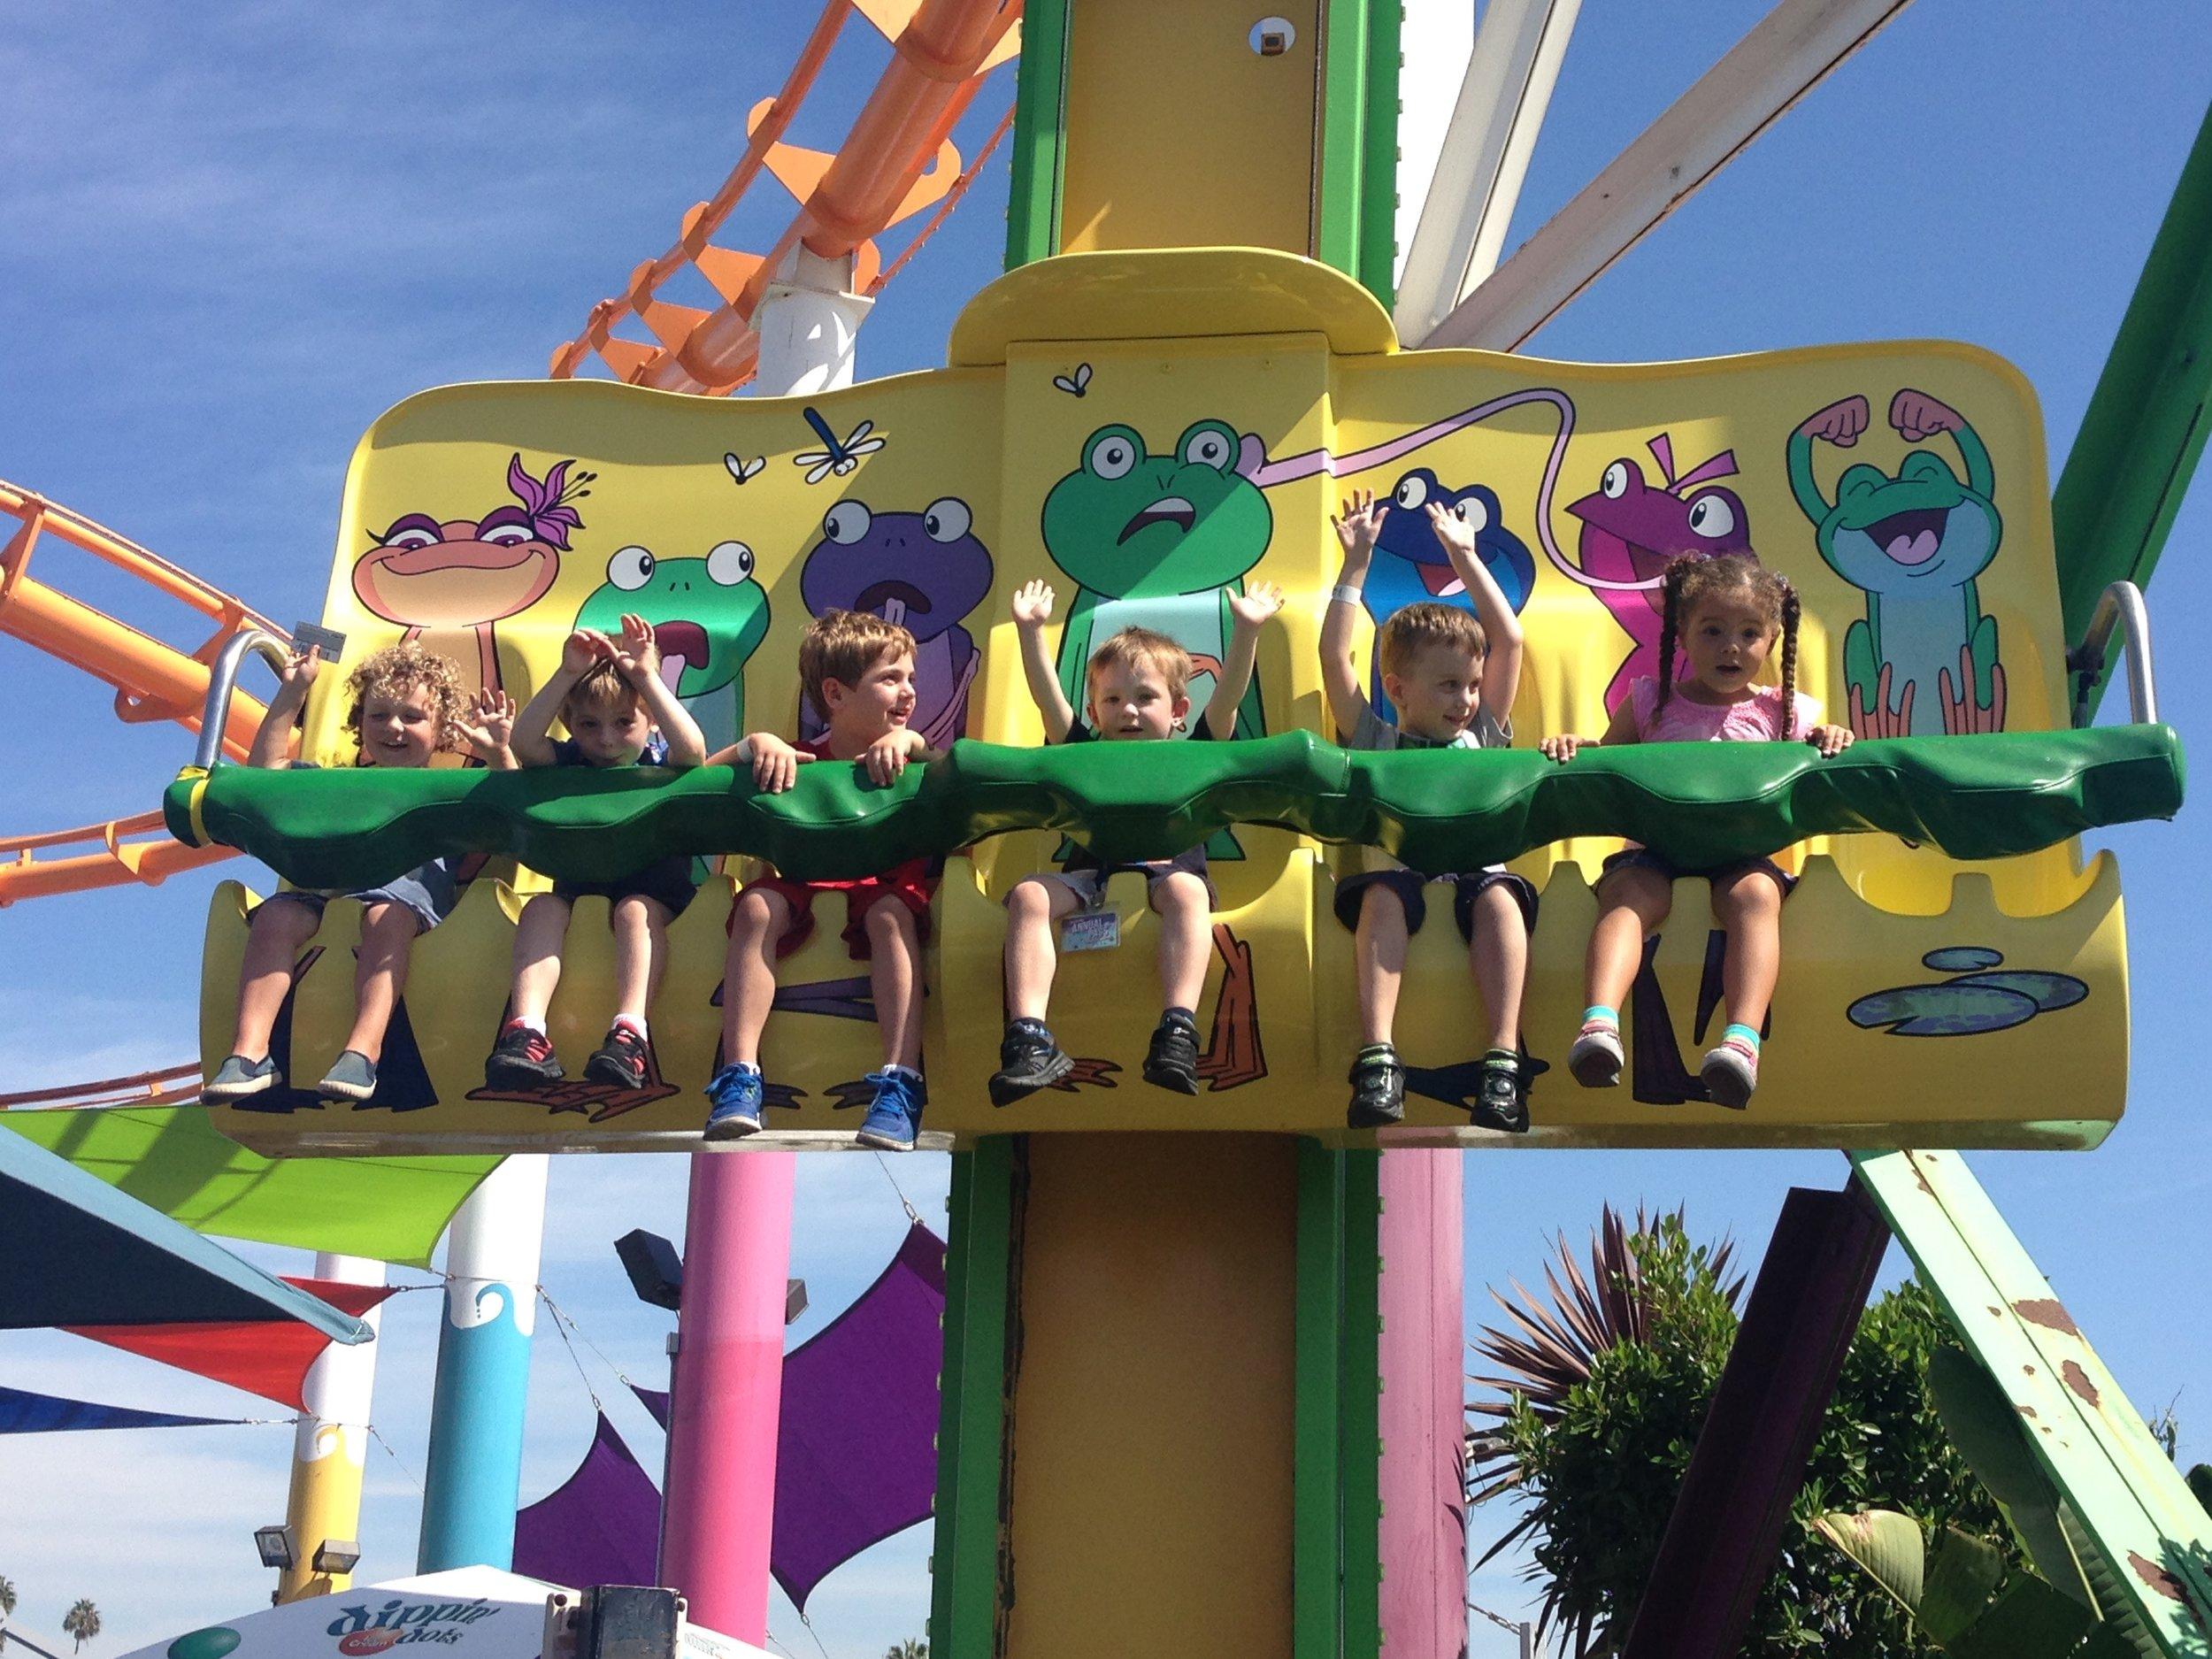 Hands in the air! The children's rides at Santa Monica Pier Amusement Park.